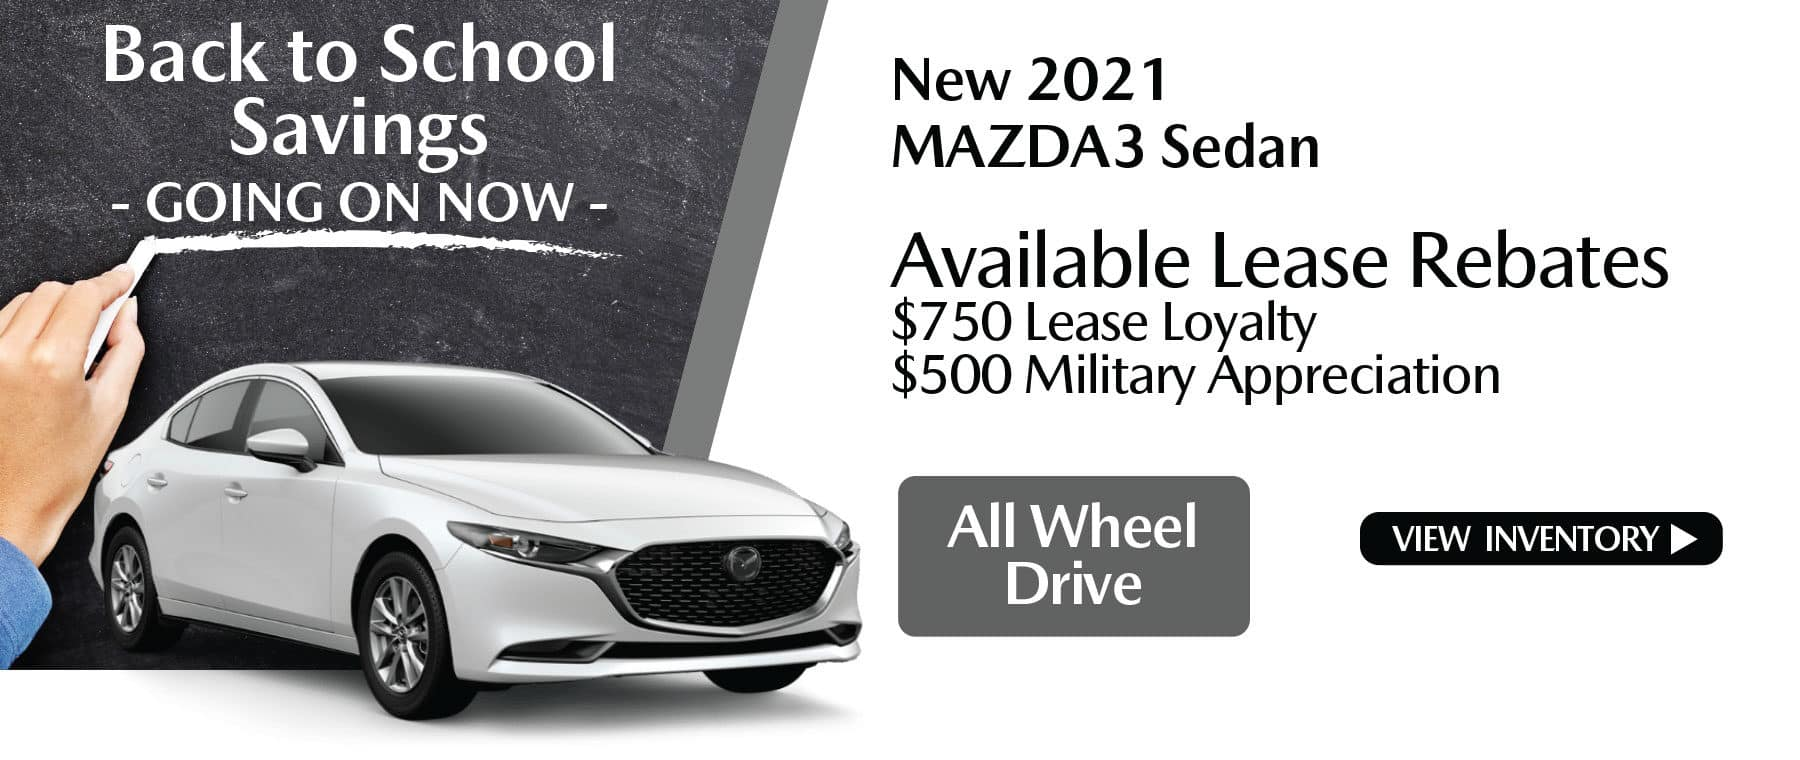 MAZDA3-HI1800x760-2